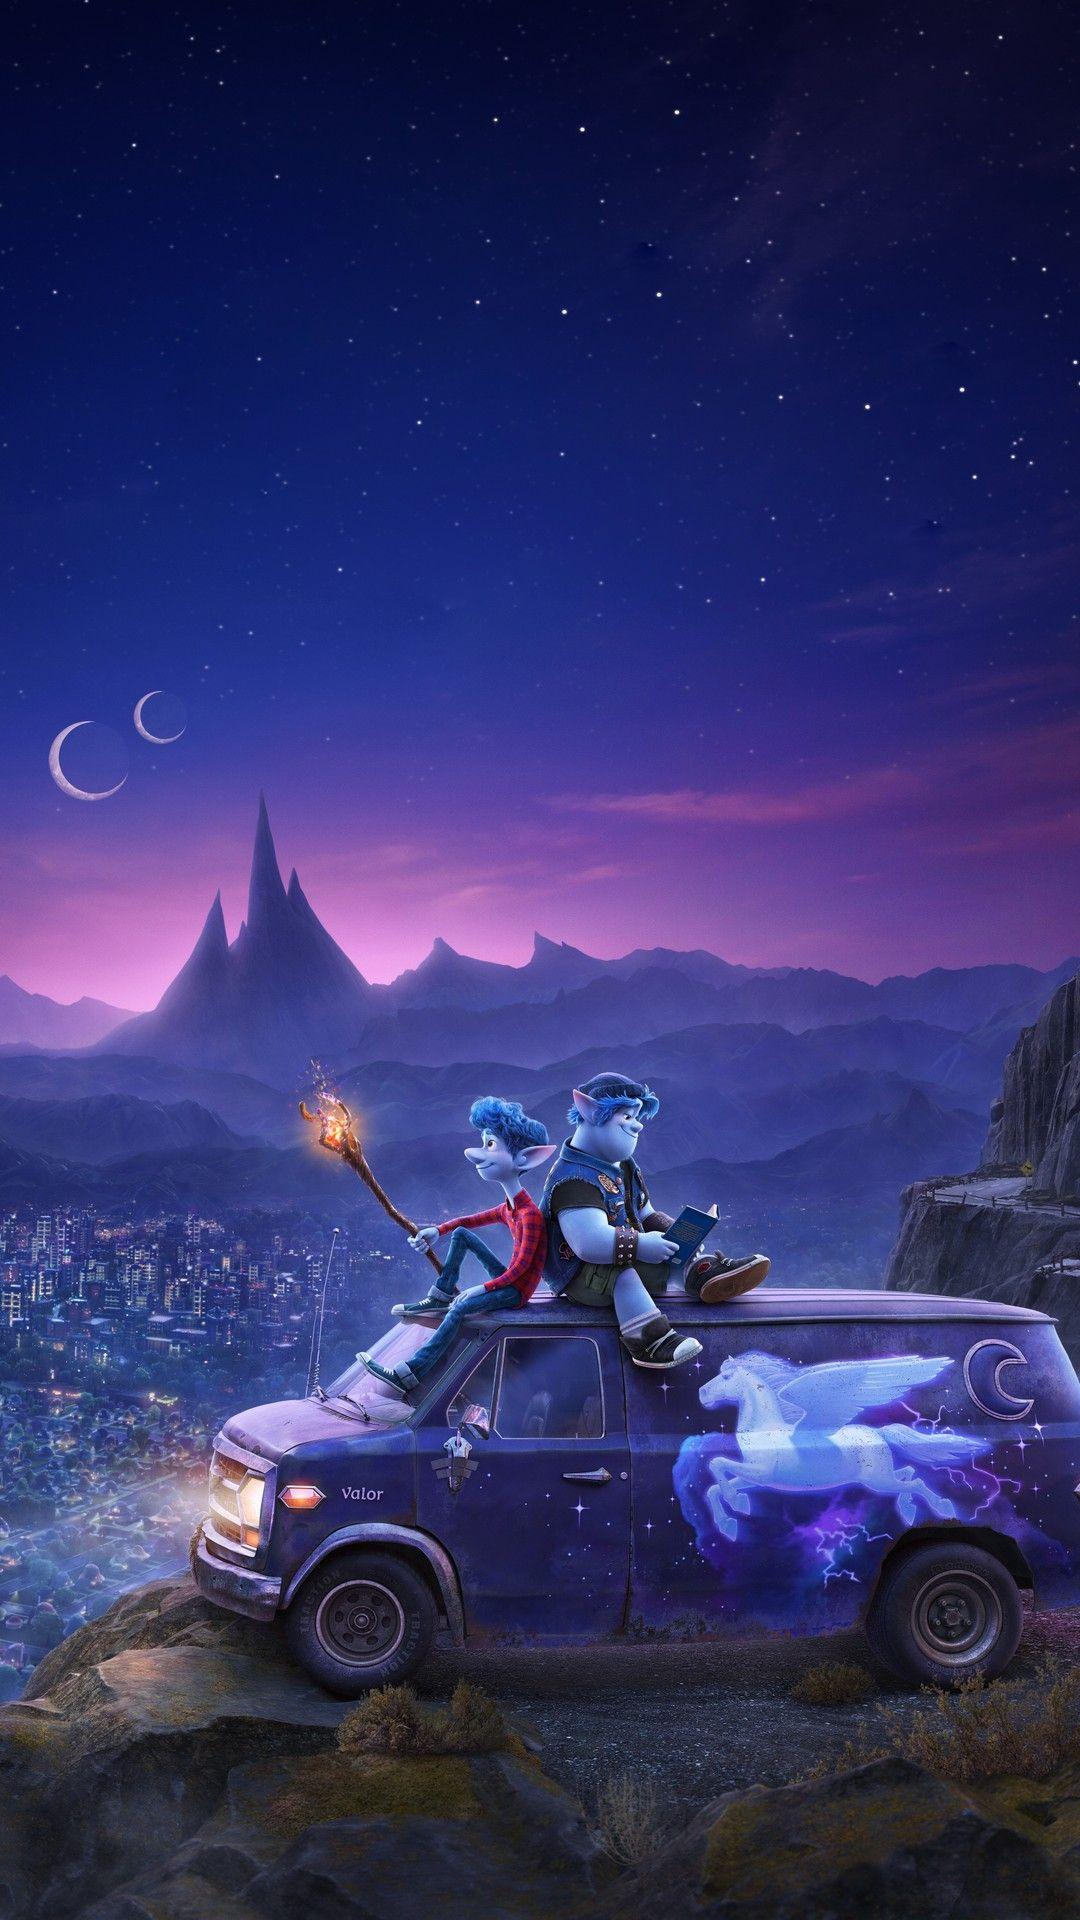 Onward 2020 mobile wallpaper Mobile Wallpapers in 2019 Pixar 1080x1920